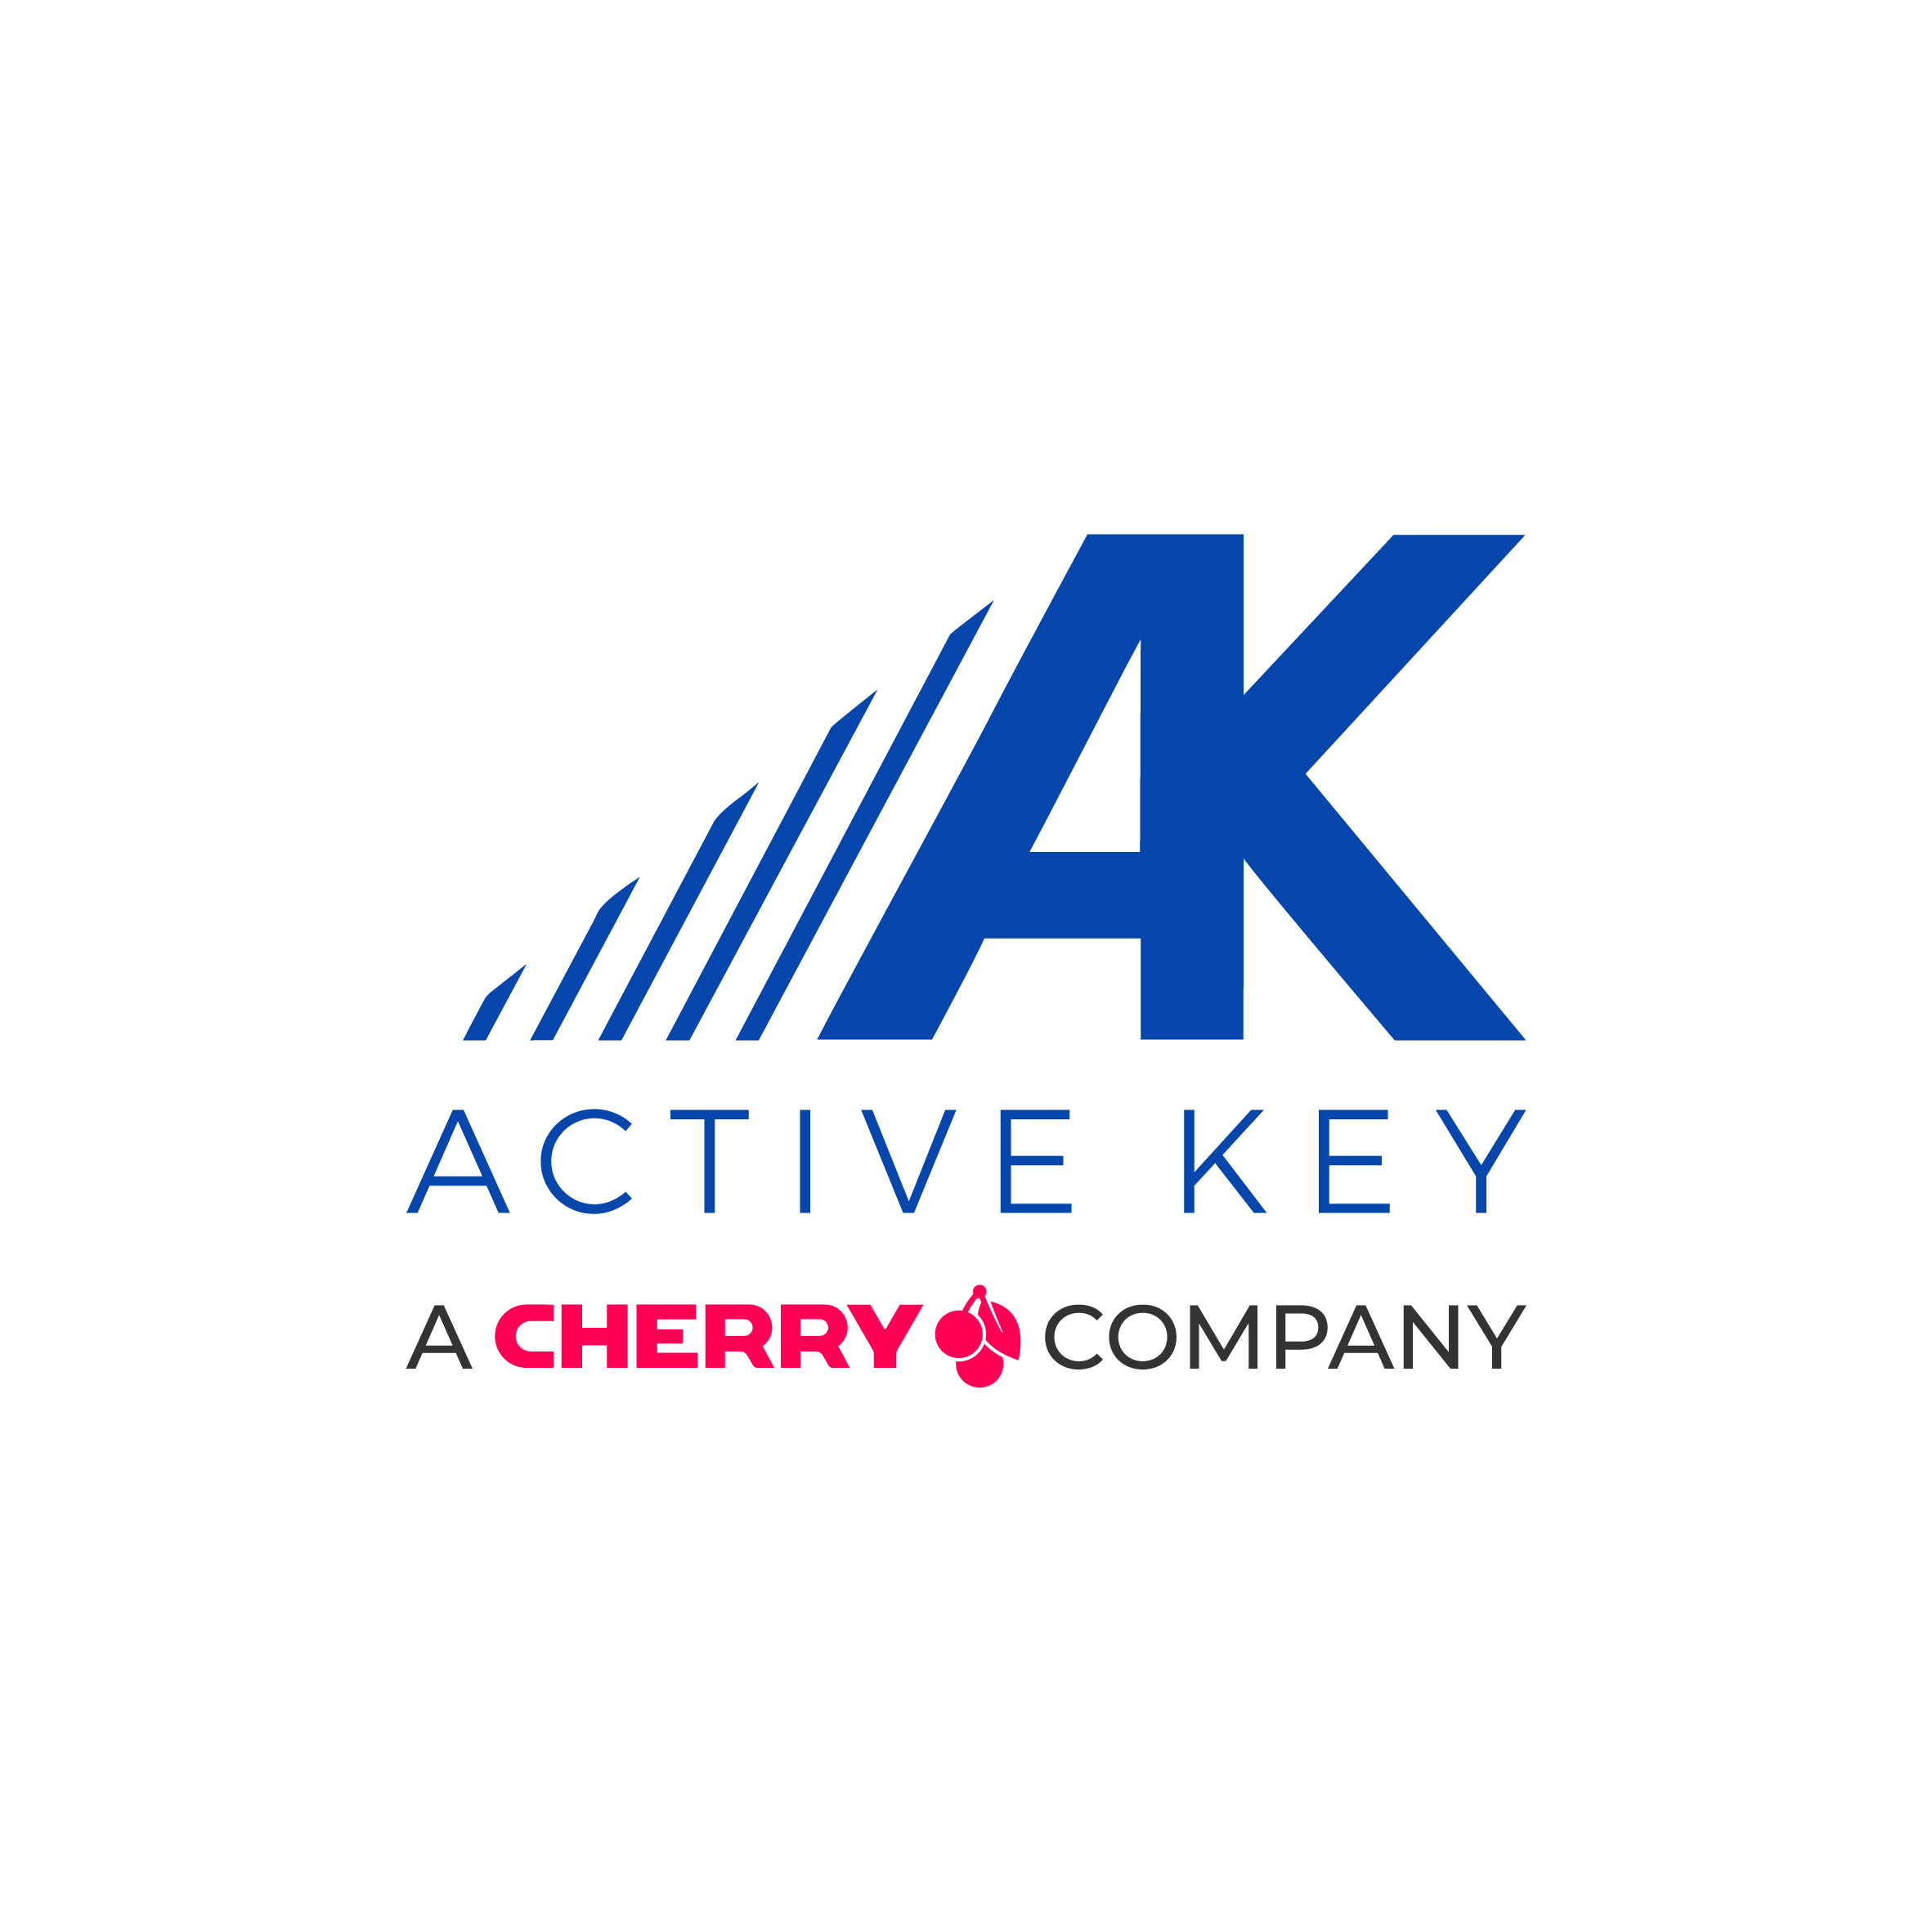 Active Key GmbH & Co. KG